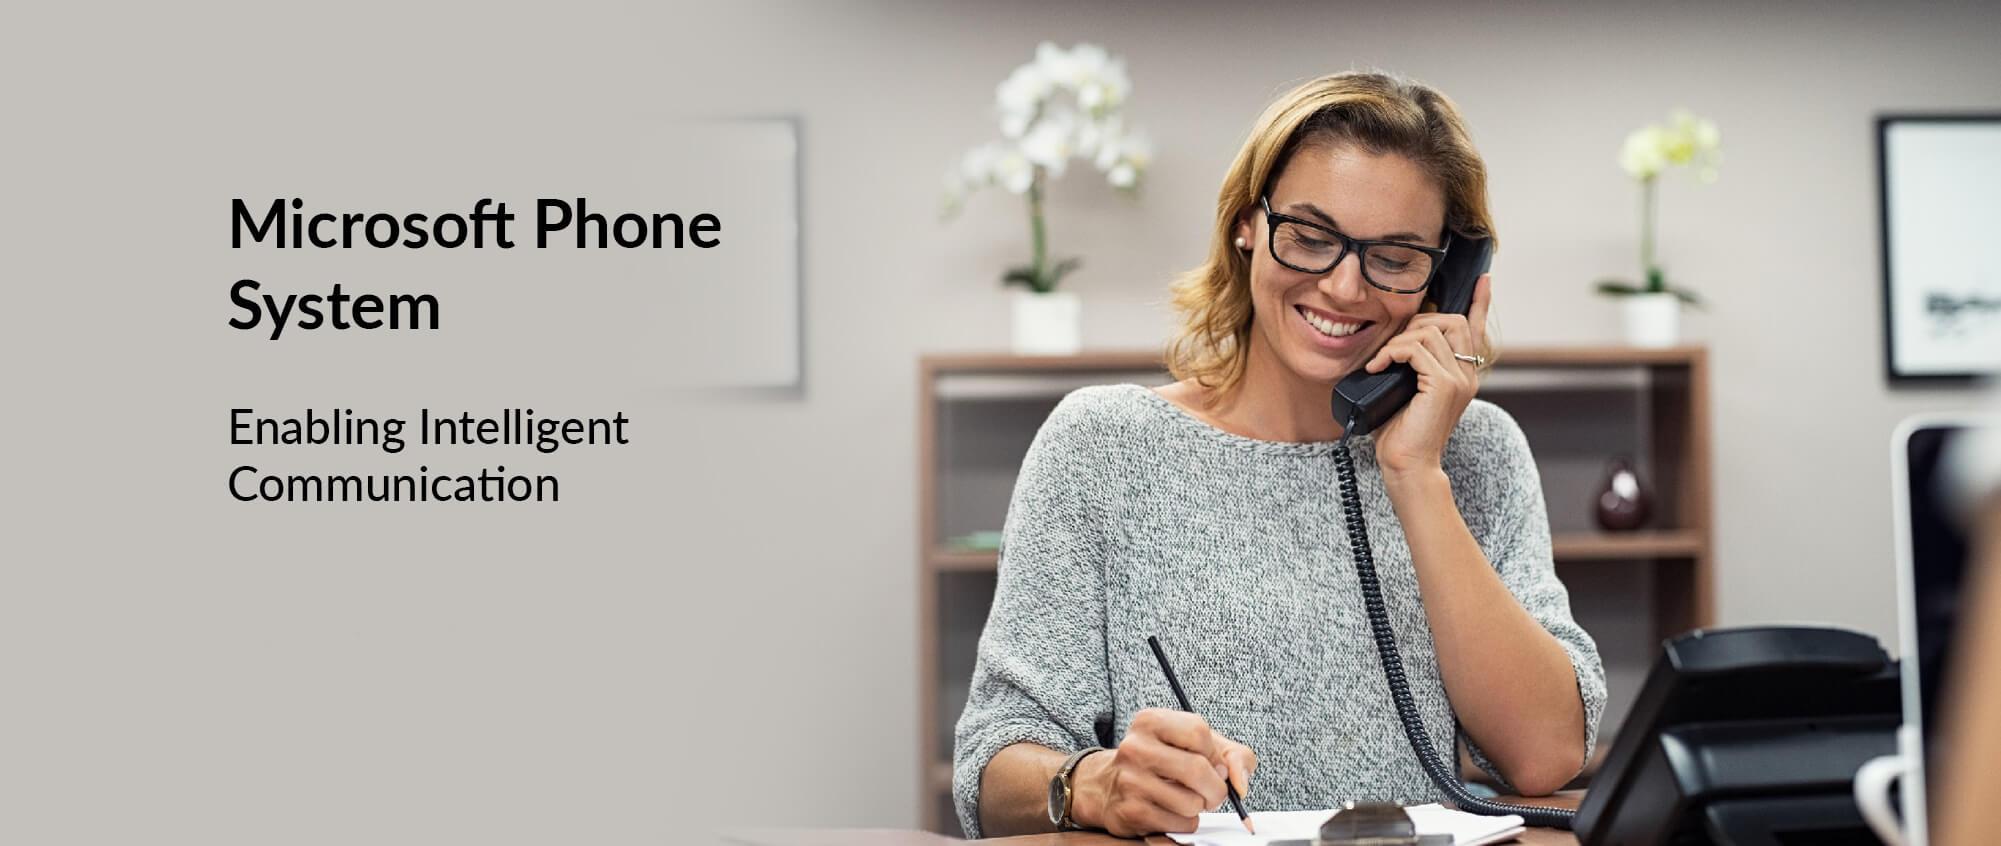 Microsoft Phone System